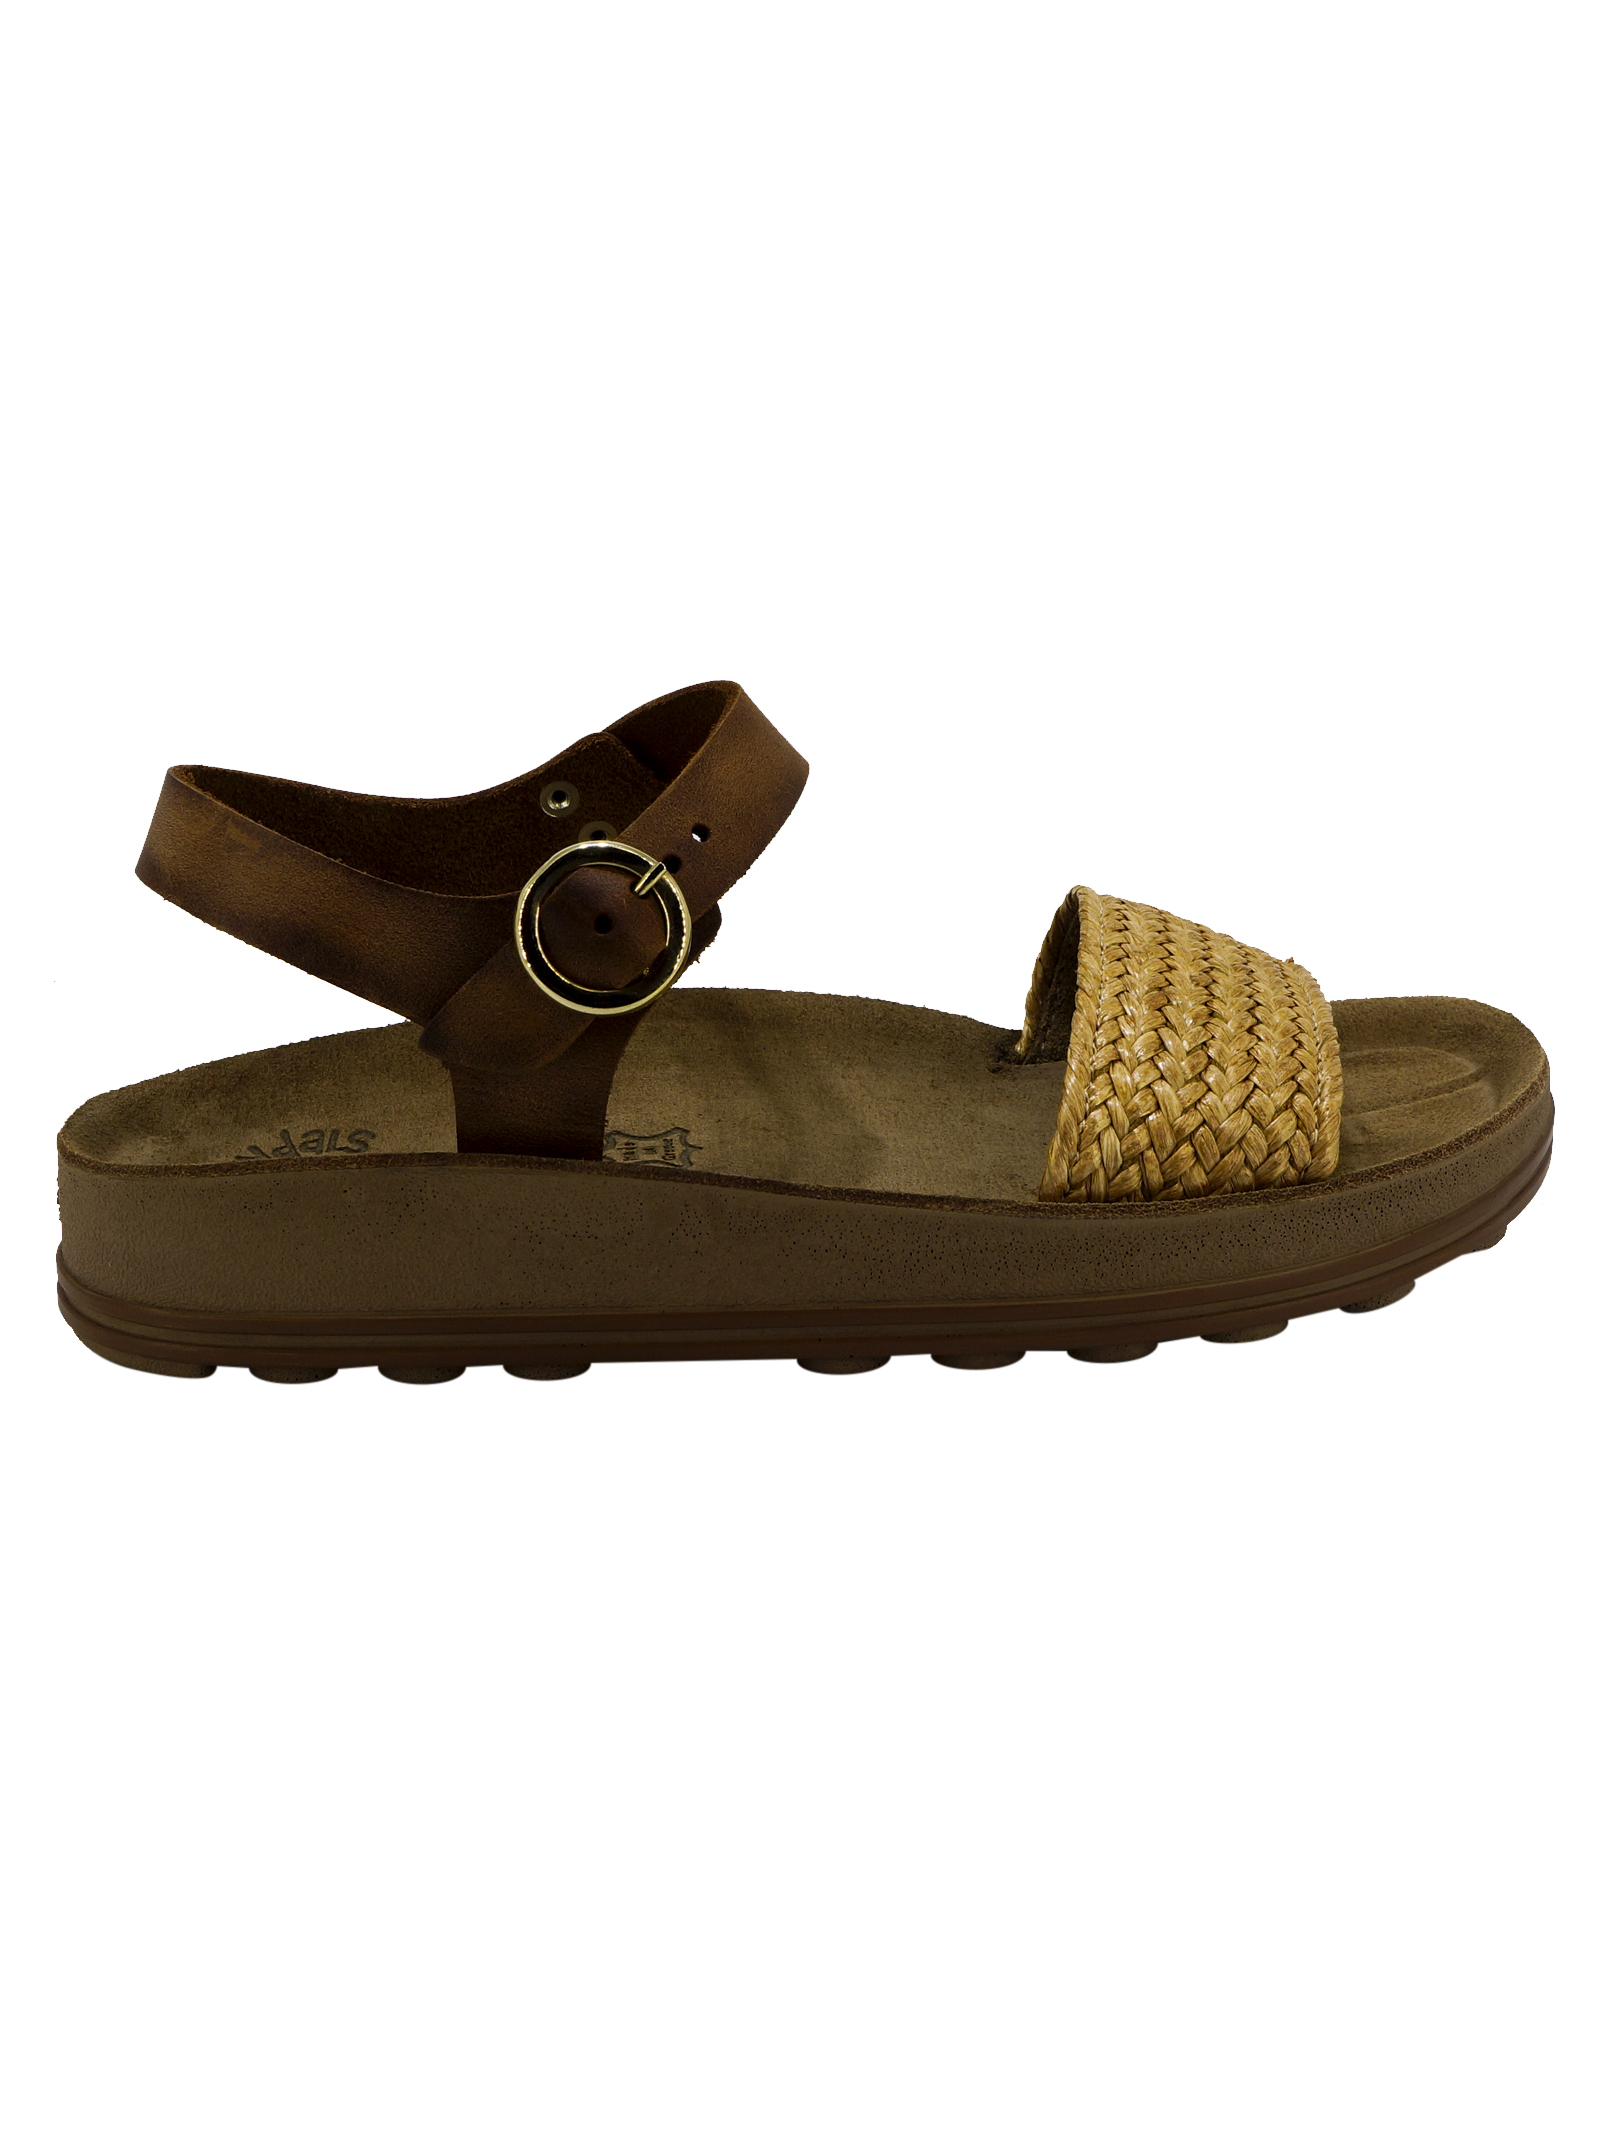 Sandali Donna Plantare Fantasy Sandals FANTASY SANDALS   Sandali   S314TAUPE